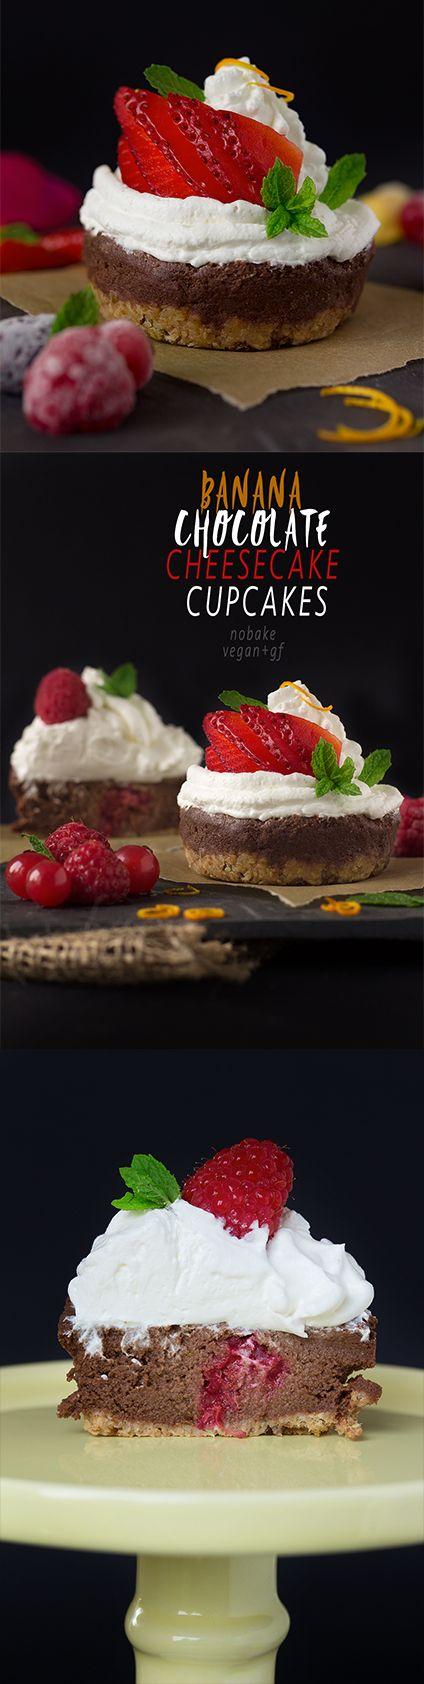 NOBAKE BANANA CHOCOLATE CHEESECAKE CUPCAKES #vegan #glutenfree with coconut whipped cream and fresh berries | VEGAN Cheesecake Cupcakes CIOCCOLATO e BANANA senza cottura con frutti di bosco e panna al latte di cocco. beautyfoodblog.com